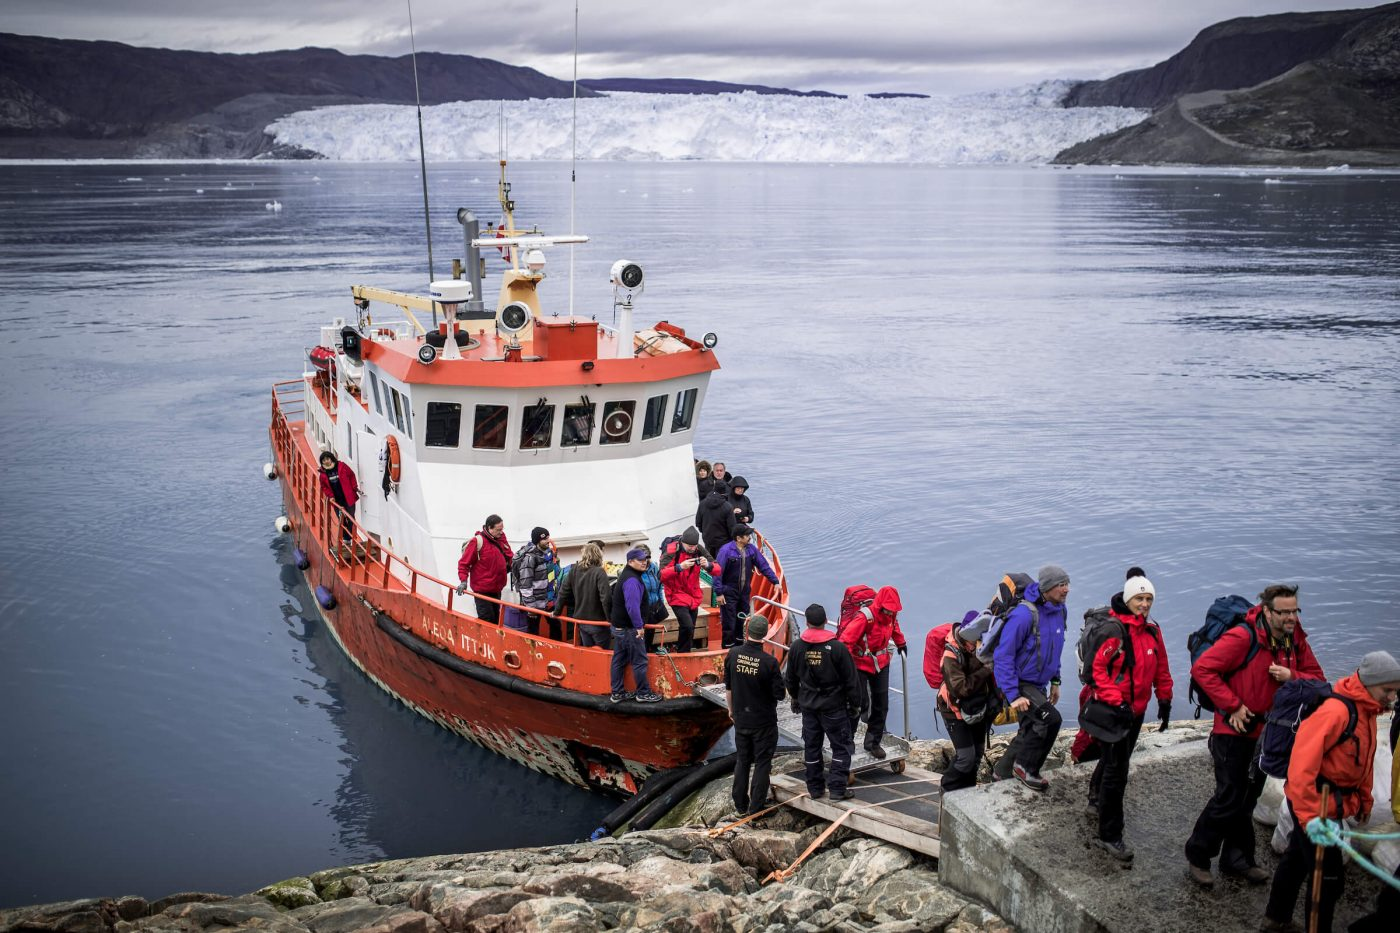 Passengers disembarking at Eqi Glacier Lodge in Greenland. Photo by Mads Pihl, Visit Greenland